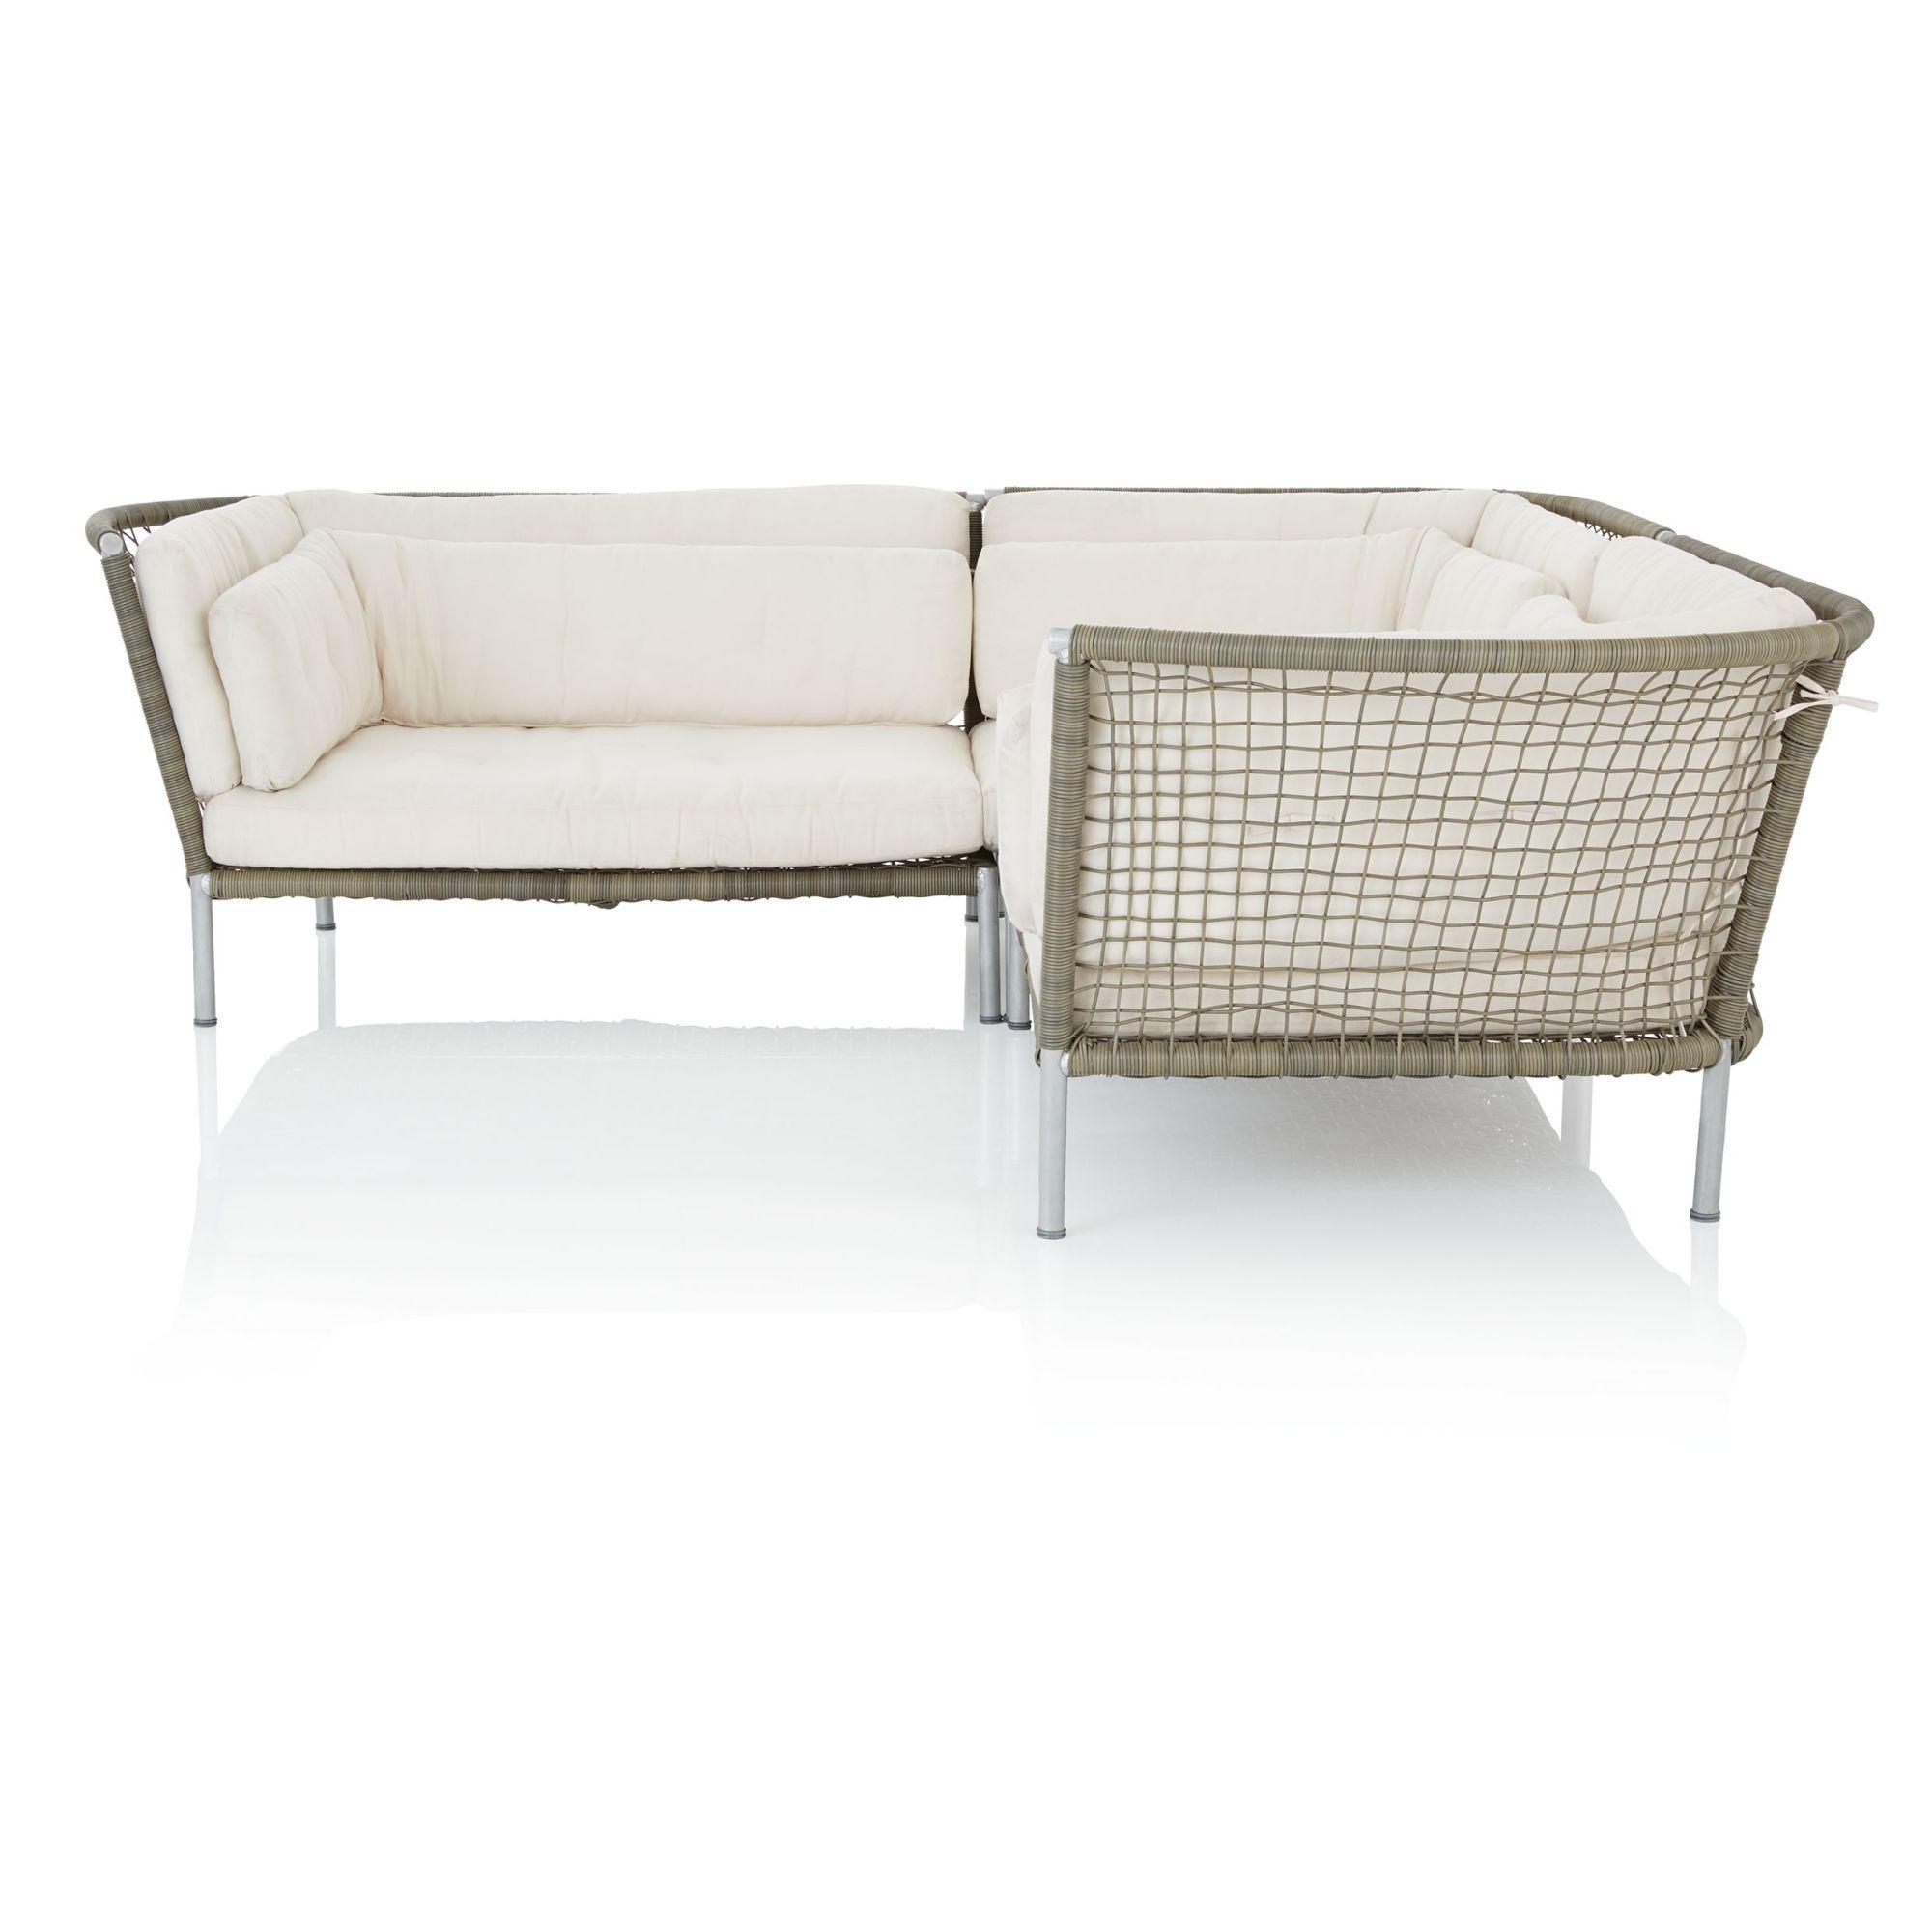 outdoor ecksofa cheap mit with outdoor ecksofa amazing ikea sofa mit ikea ecksofa mit beste. Black Bedroom Furniture Sets. Home Design Ideas